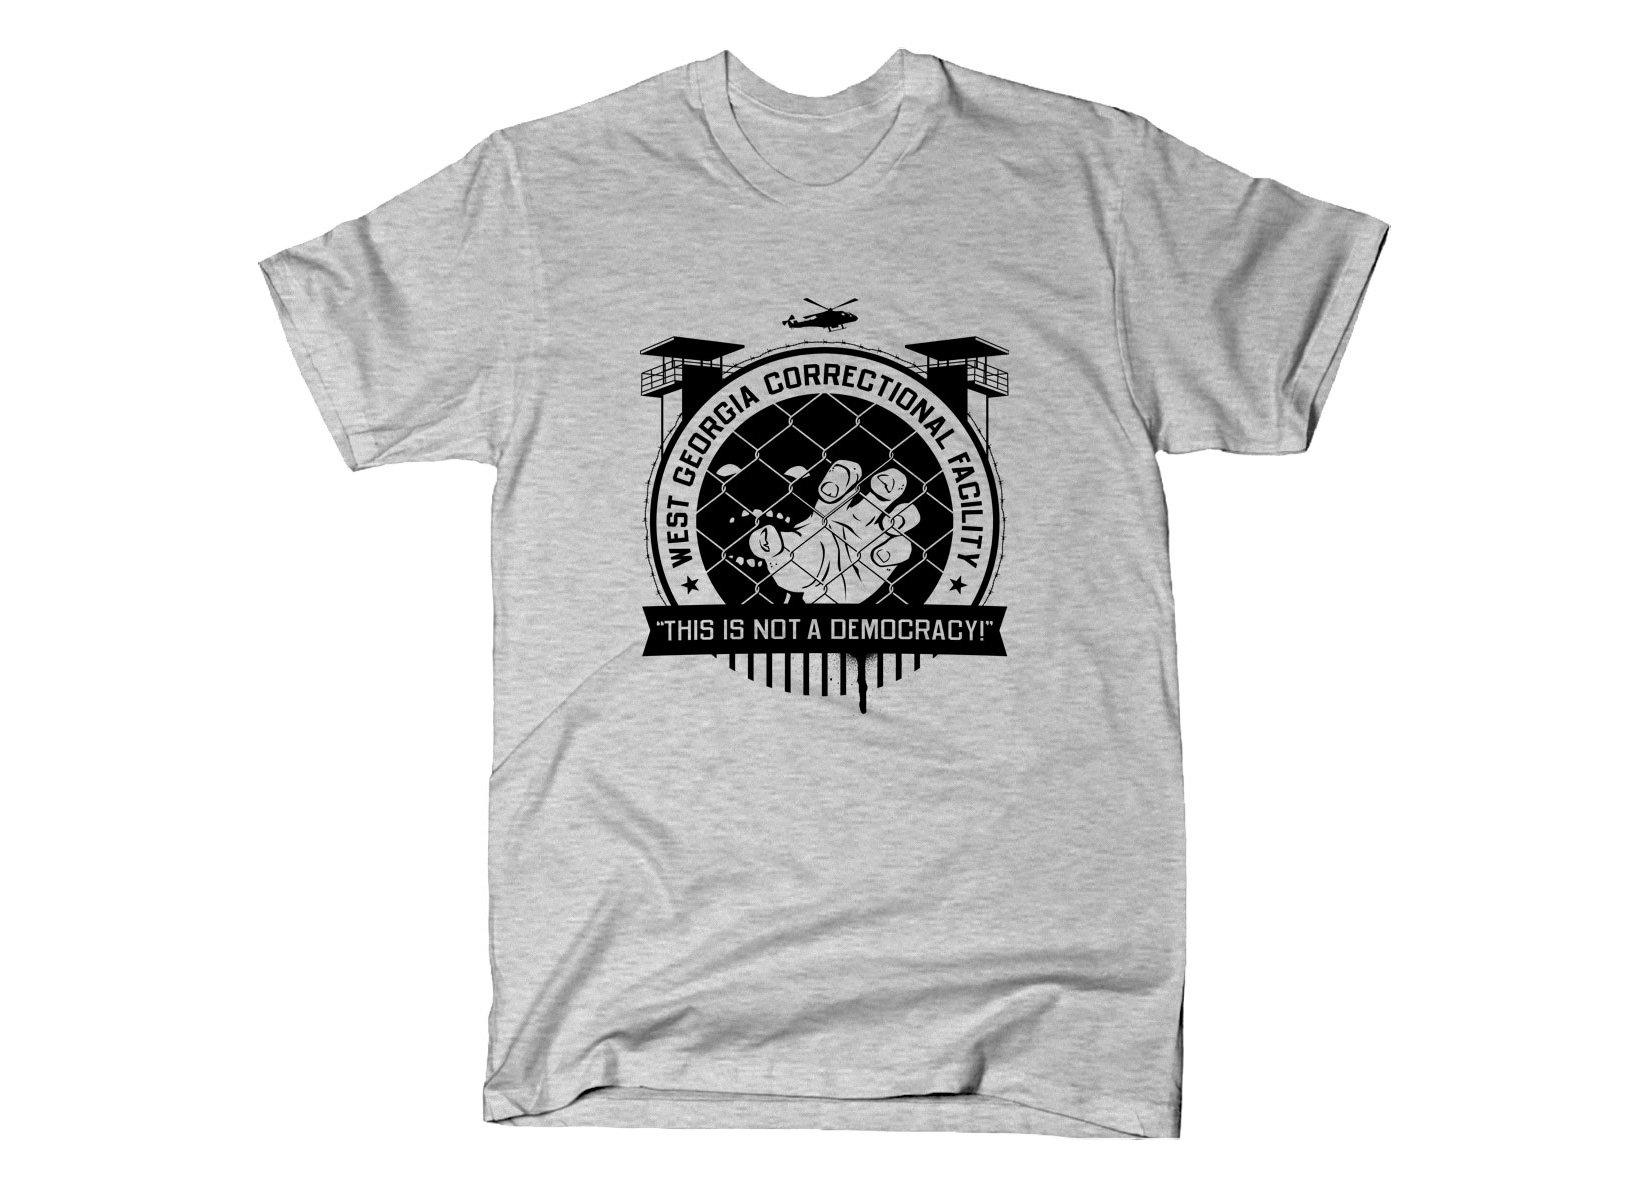 West Georgia Correctional Facility on Mens T-Shirt